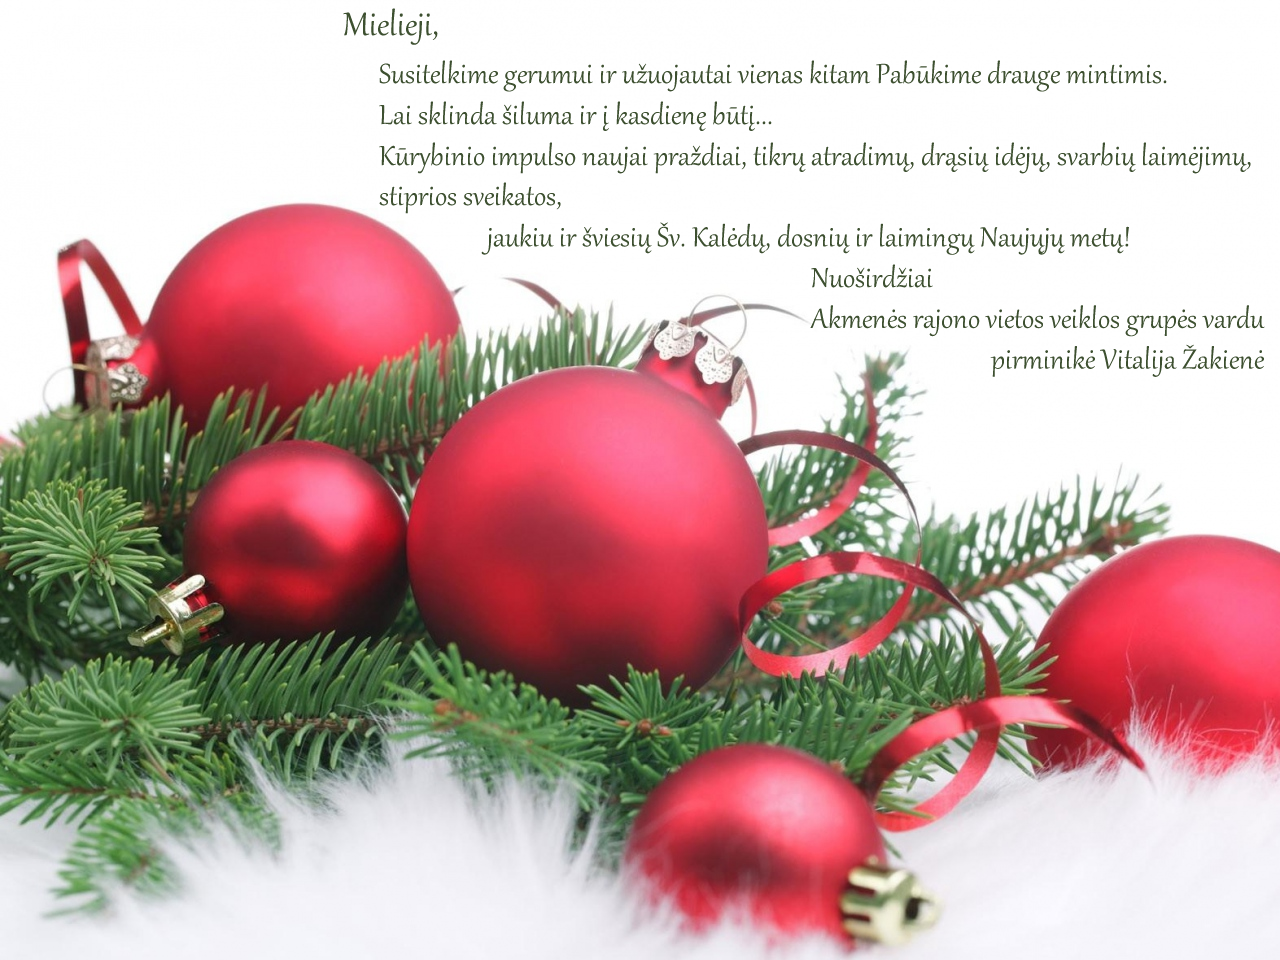 christmas-decorations-balloons-thread-needles-fur-holiday-christmas-1280x960-fw